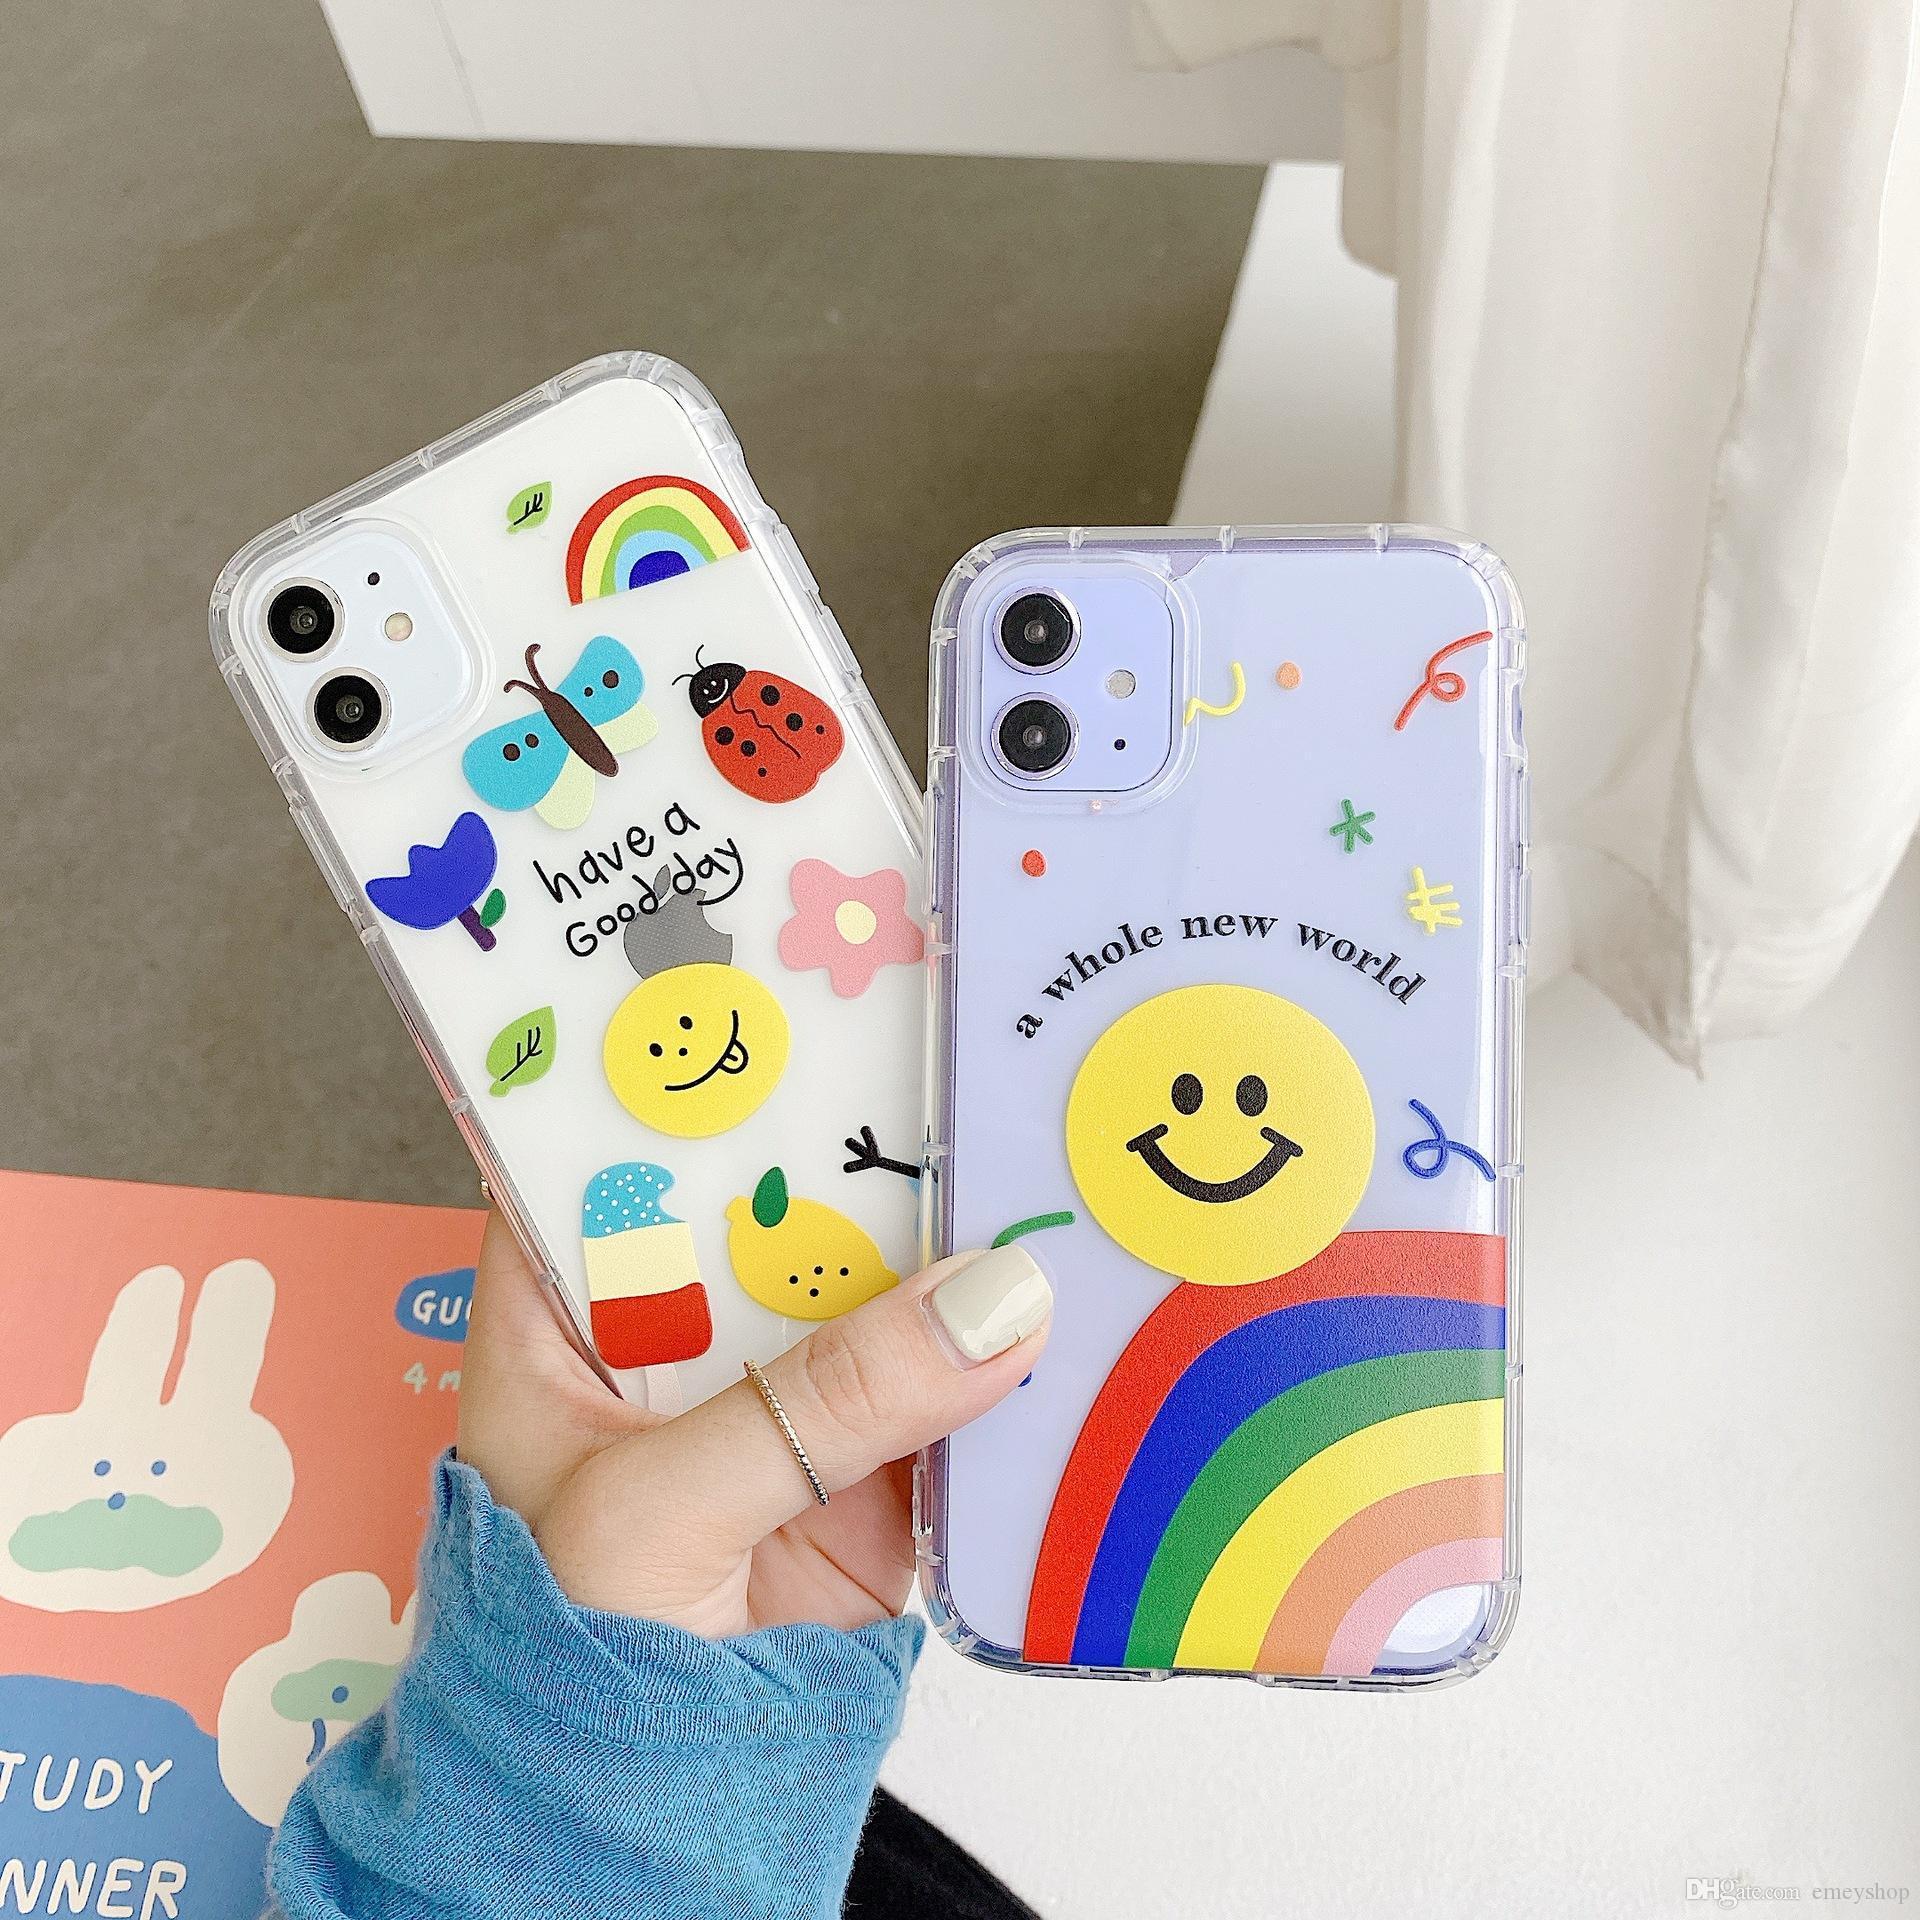 3D bonito Limpar Moda Telefone capa para iPhone SE Caso X XS Max Xr 11 Pro 8 7 6s Além disso Bling macia Fundas Tampa Coque